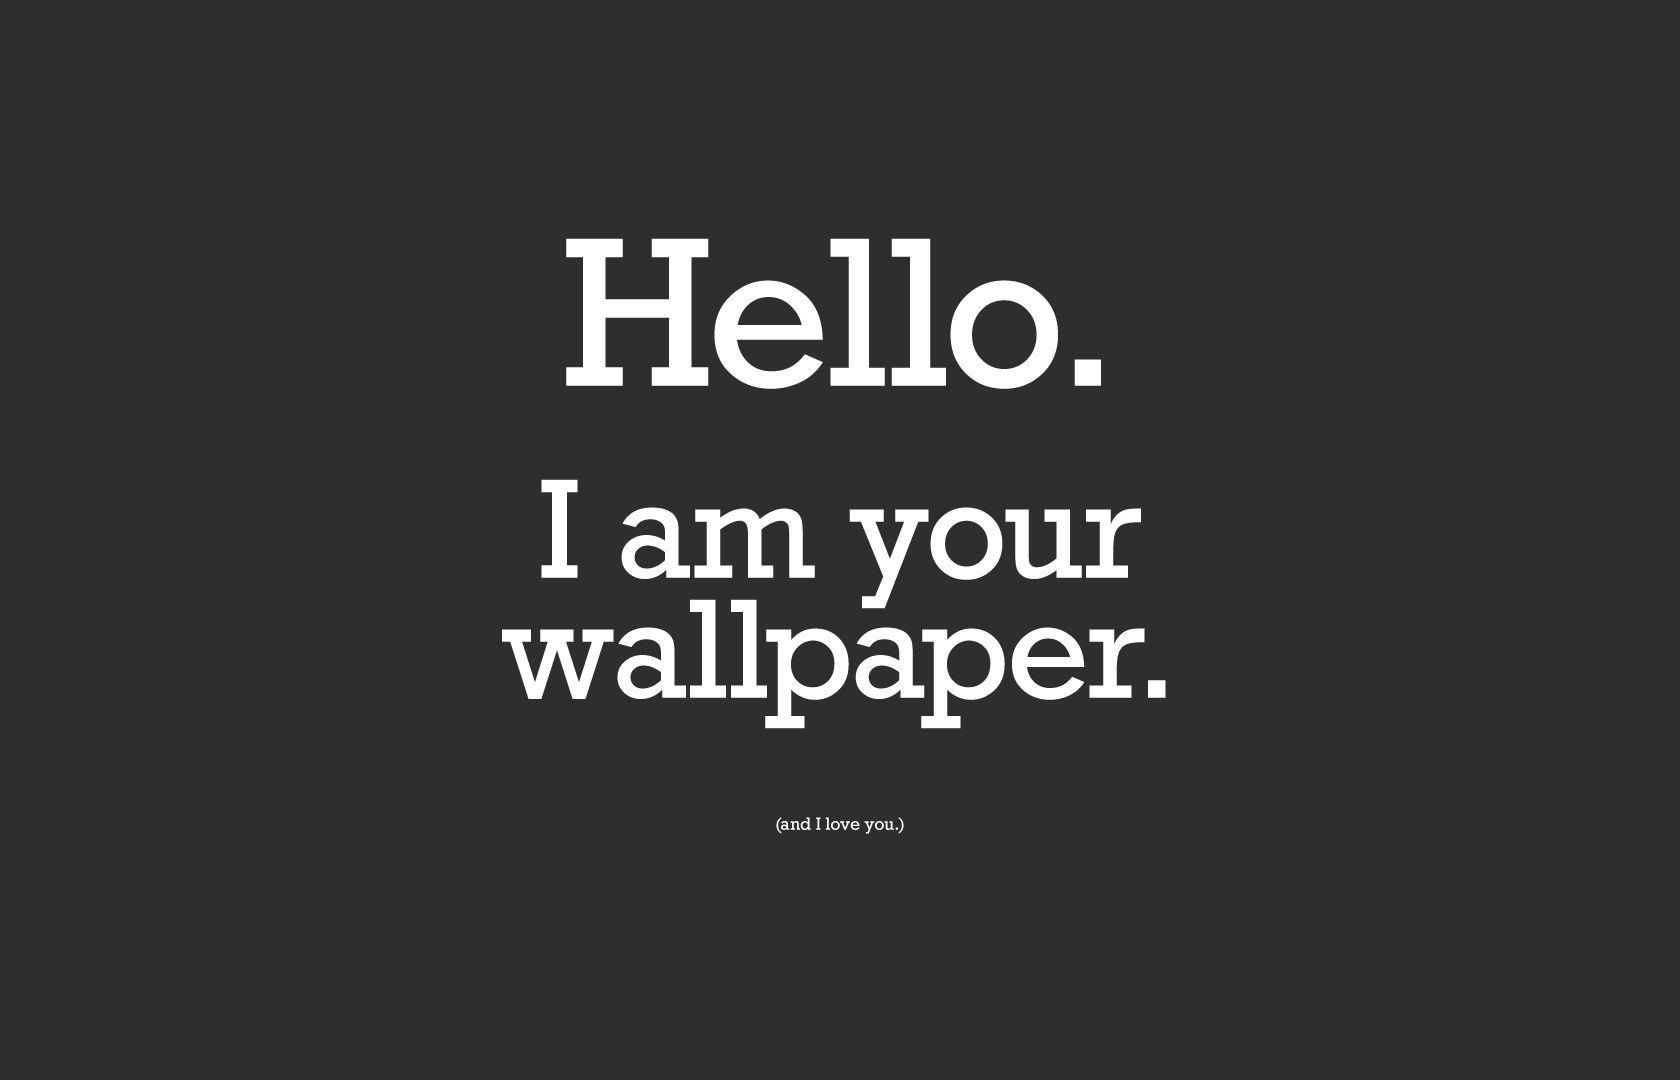 Funny Desktop Wallpapers Free - Wallpaper Cave